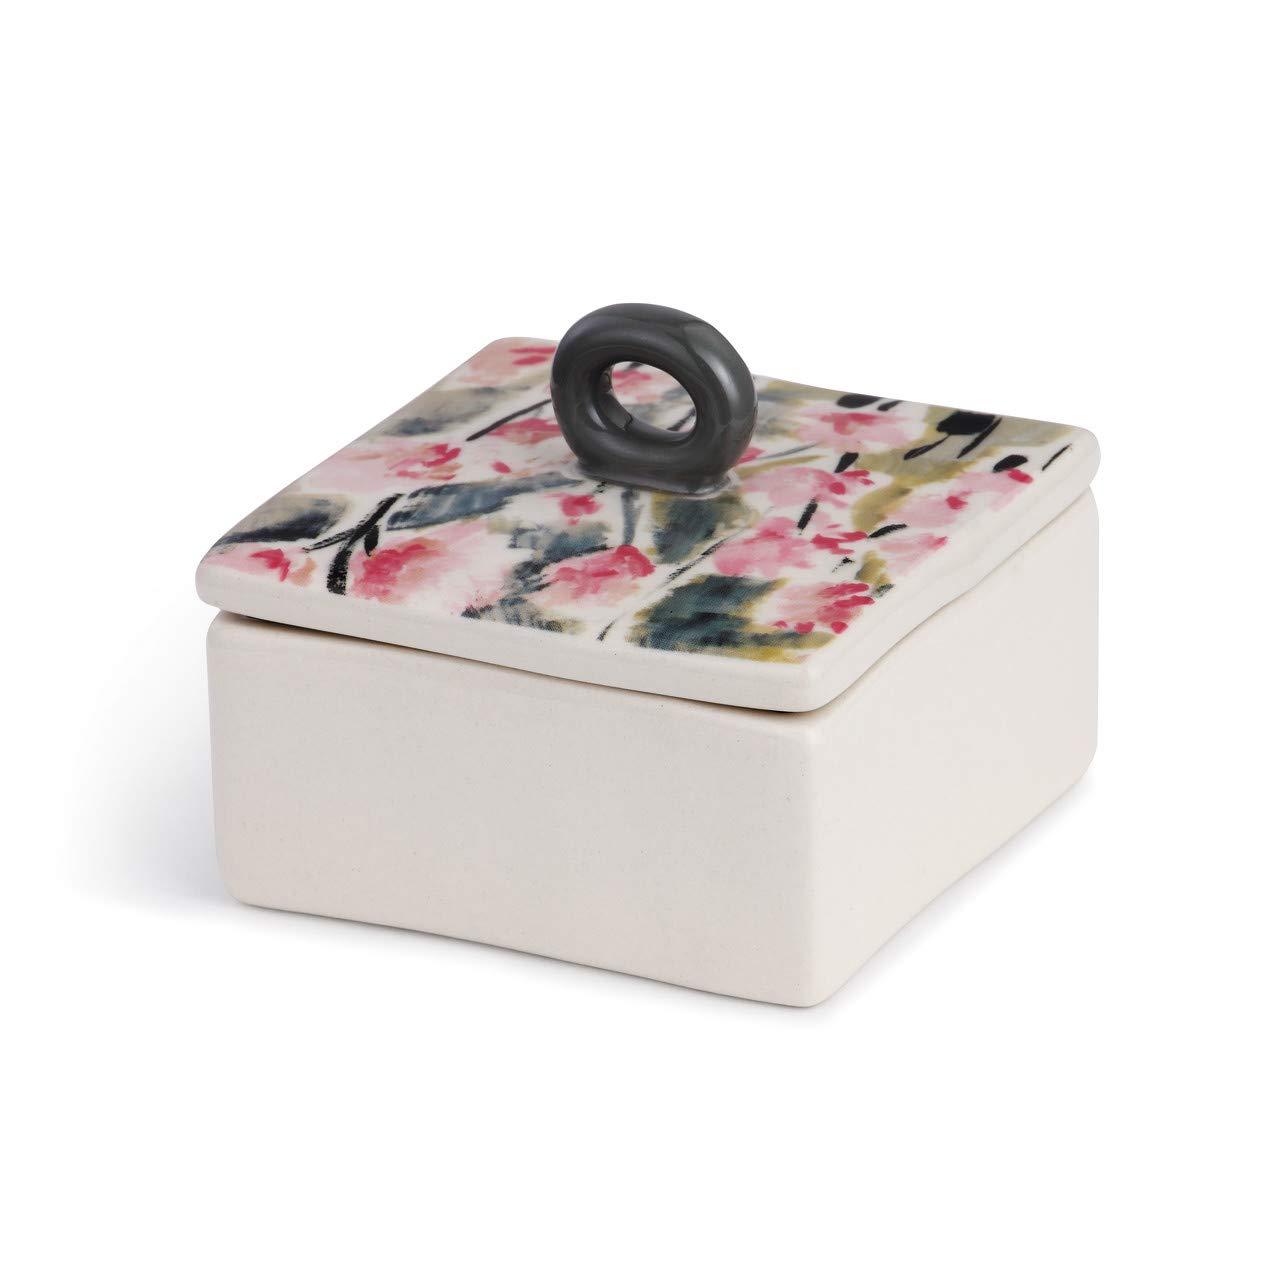 DEMDACO Painterly Floral Glossy 粉色 7.62 x 7.62 cm 陶瓷陶瓷首饰饰品首饰首饰首饰首饰首饰首饰首饰首饰首饰首饰首饰首饰盒